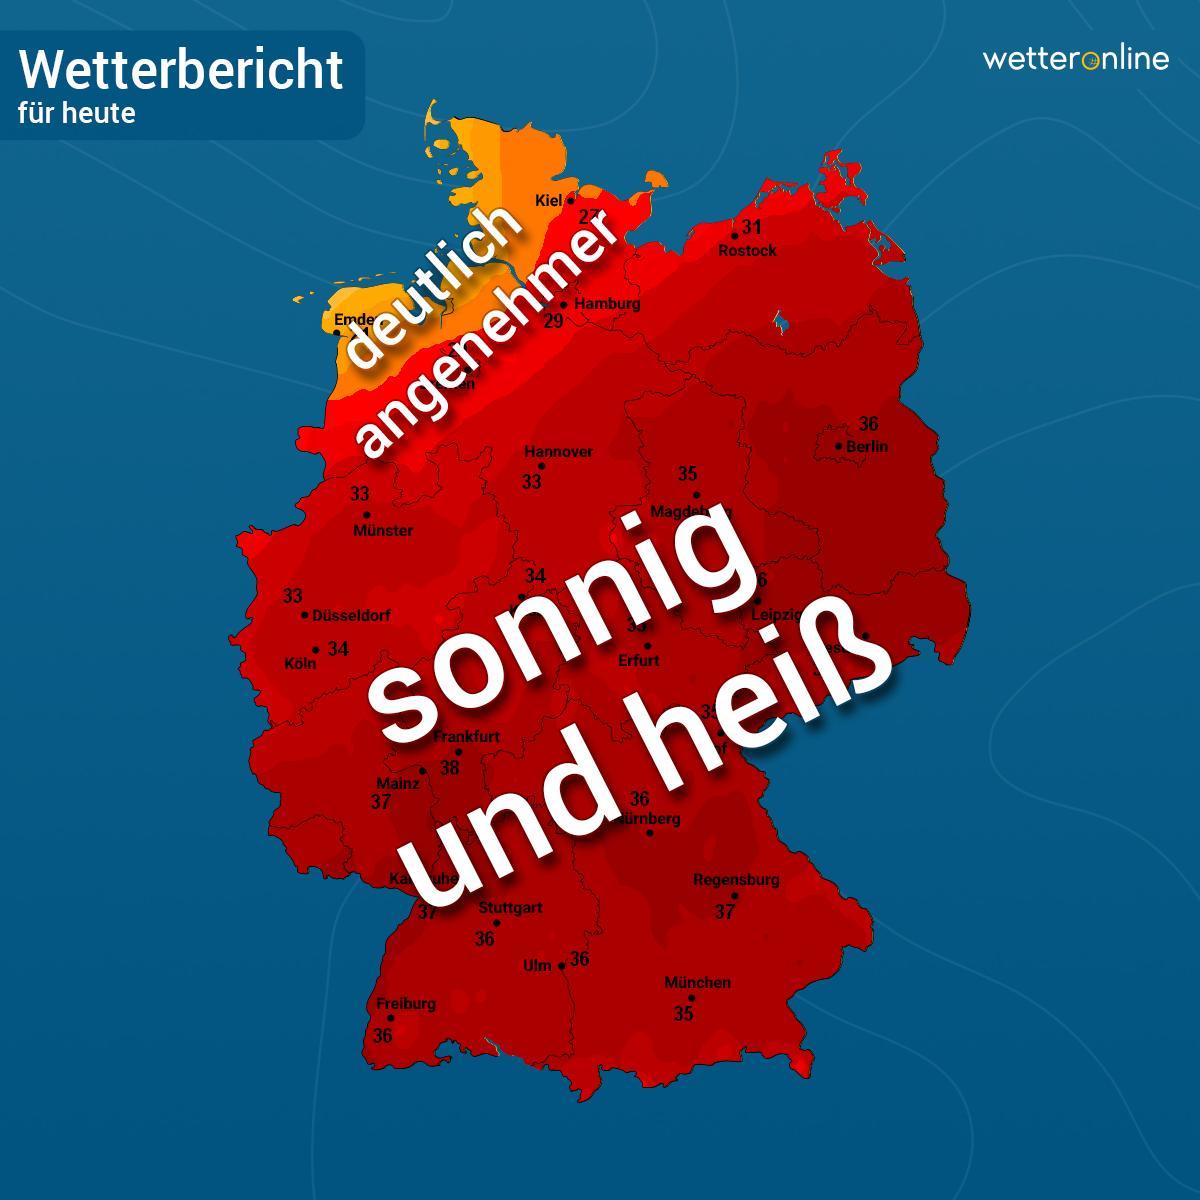 Wetteronlinede On Twitter Guten Morgen Halbwegs Schlafen